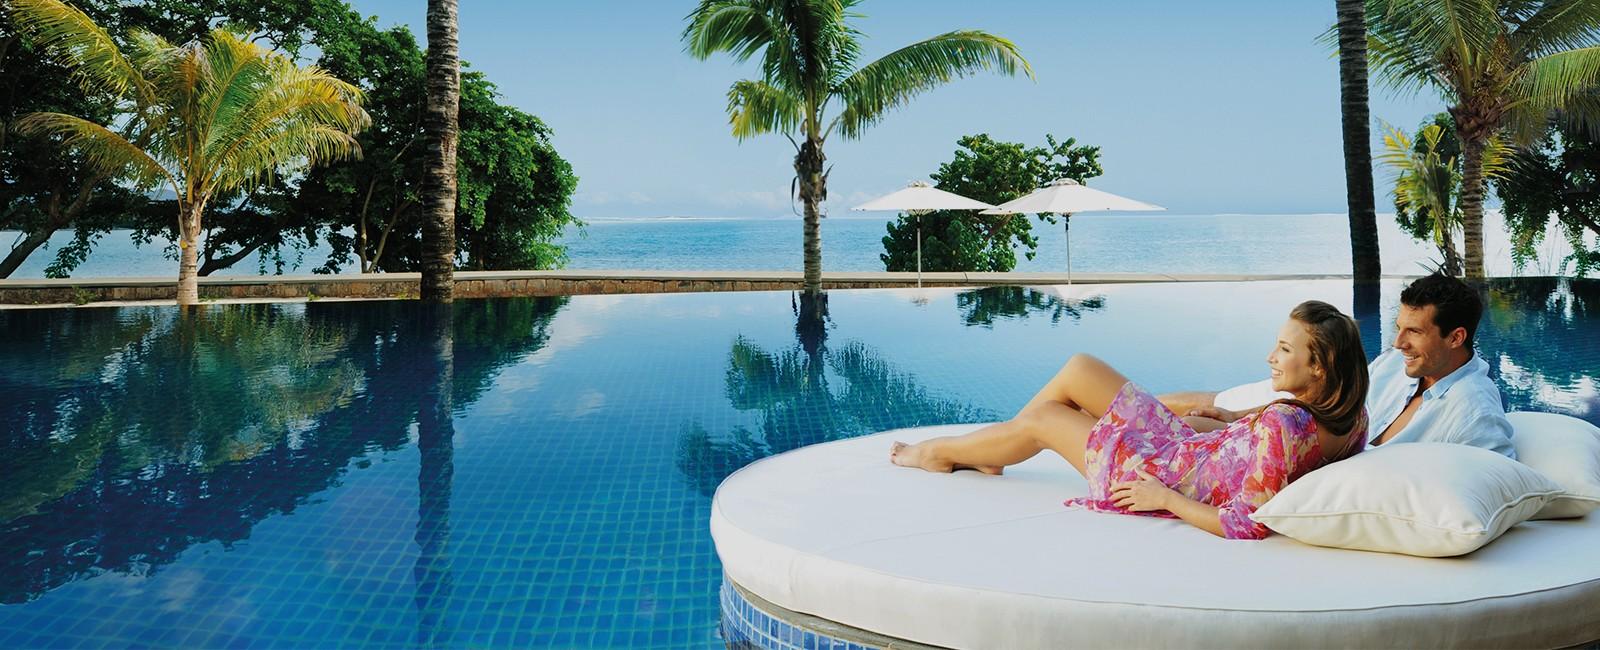 couples holidays - luxury holidays - header